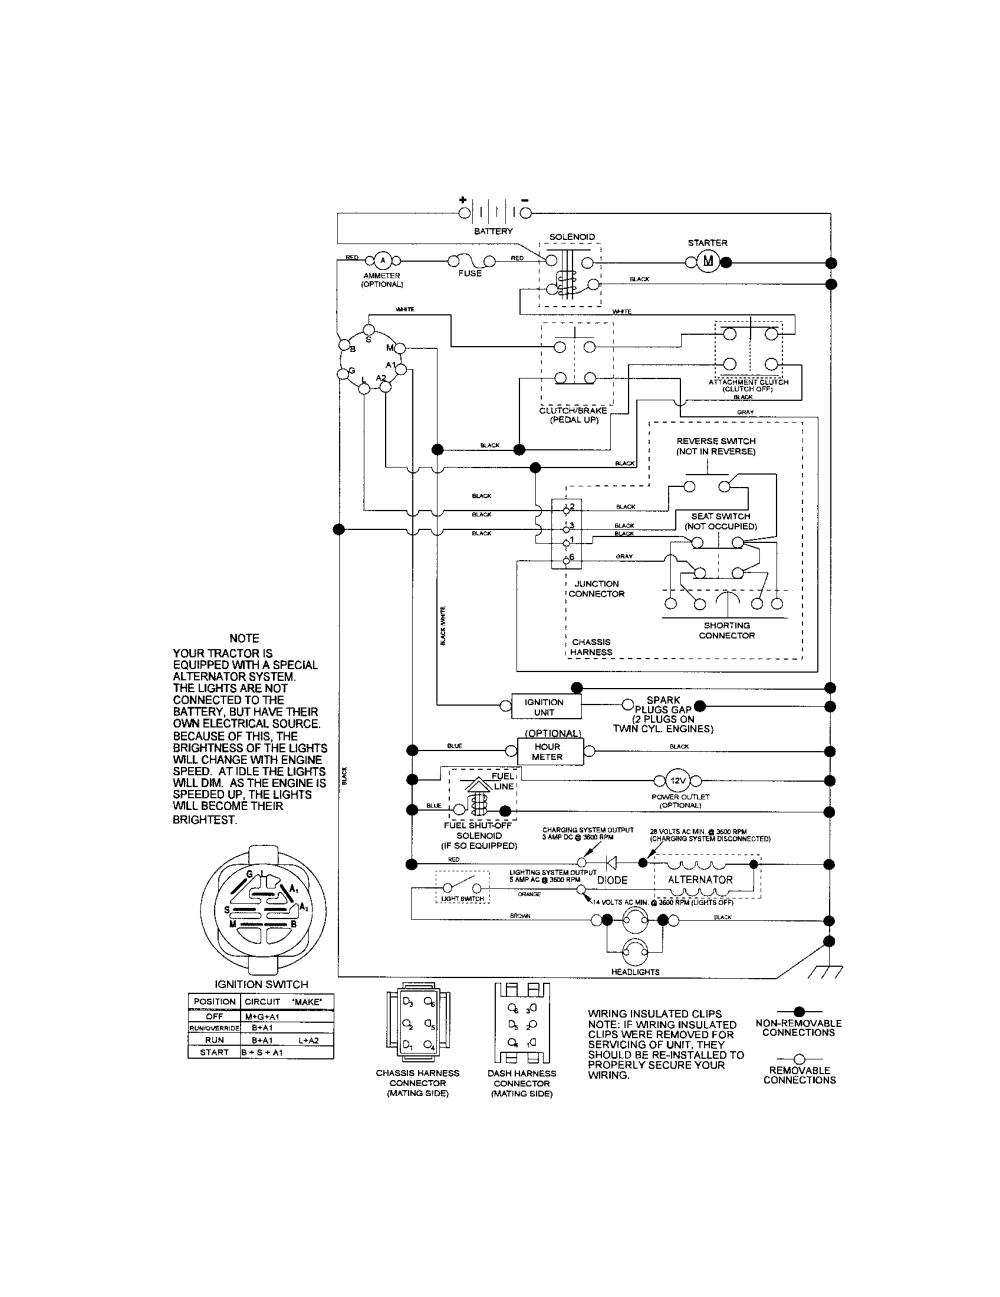 medium resolution of craftsman 917287130 schematic diagram tractor diagram